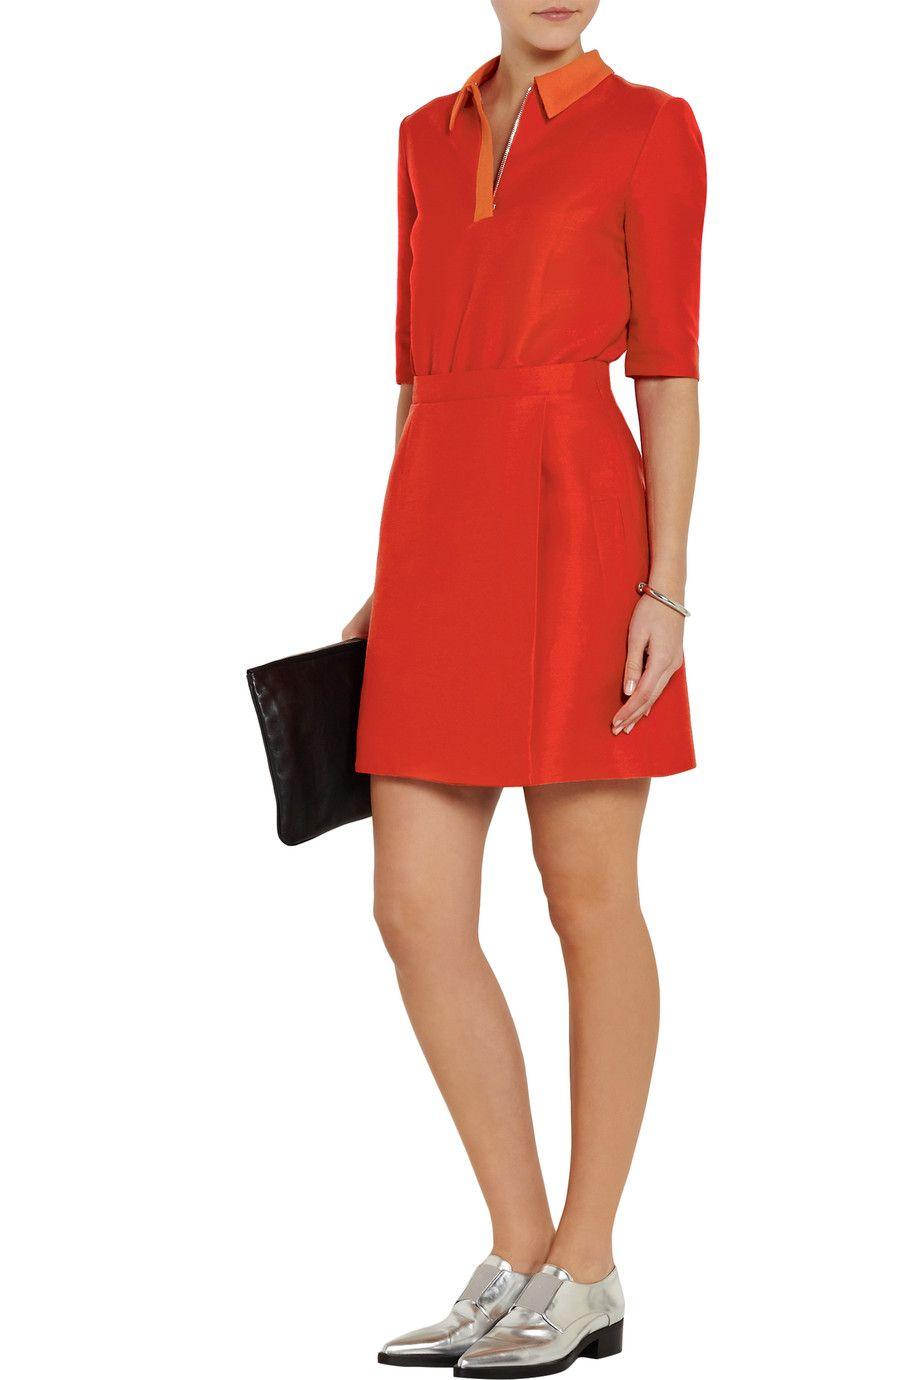 Tomato Red Contrast Collar Cady Dress Victoria Victoria Beckham Contrast Collar Dresses Victoria Dress [ 1380 x 920 Pixel ]